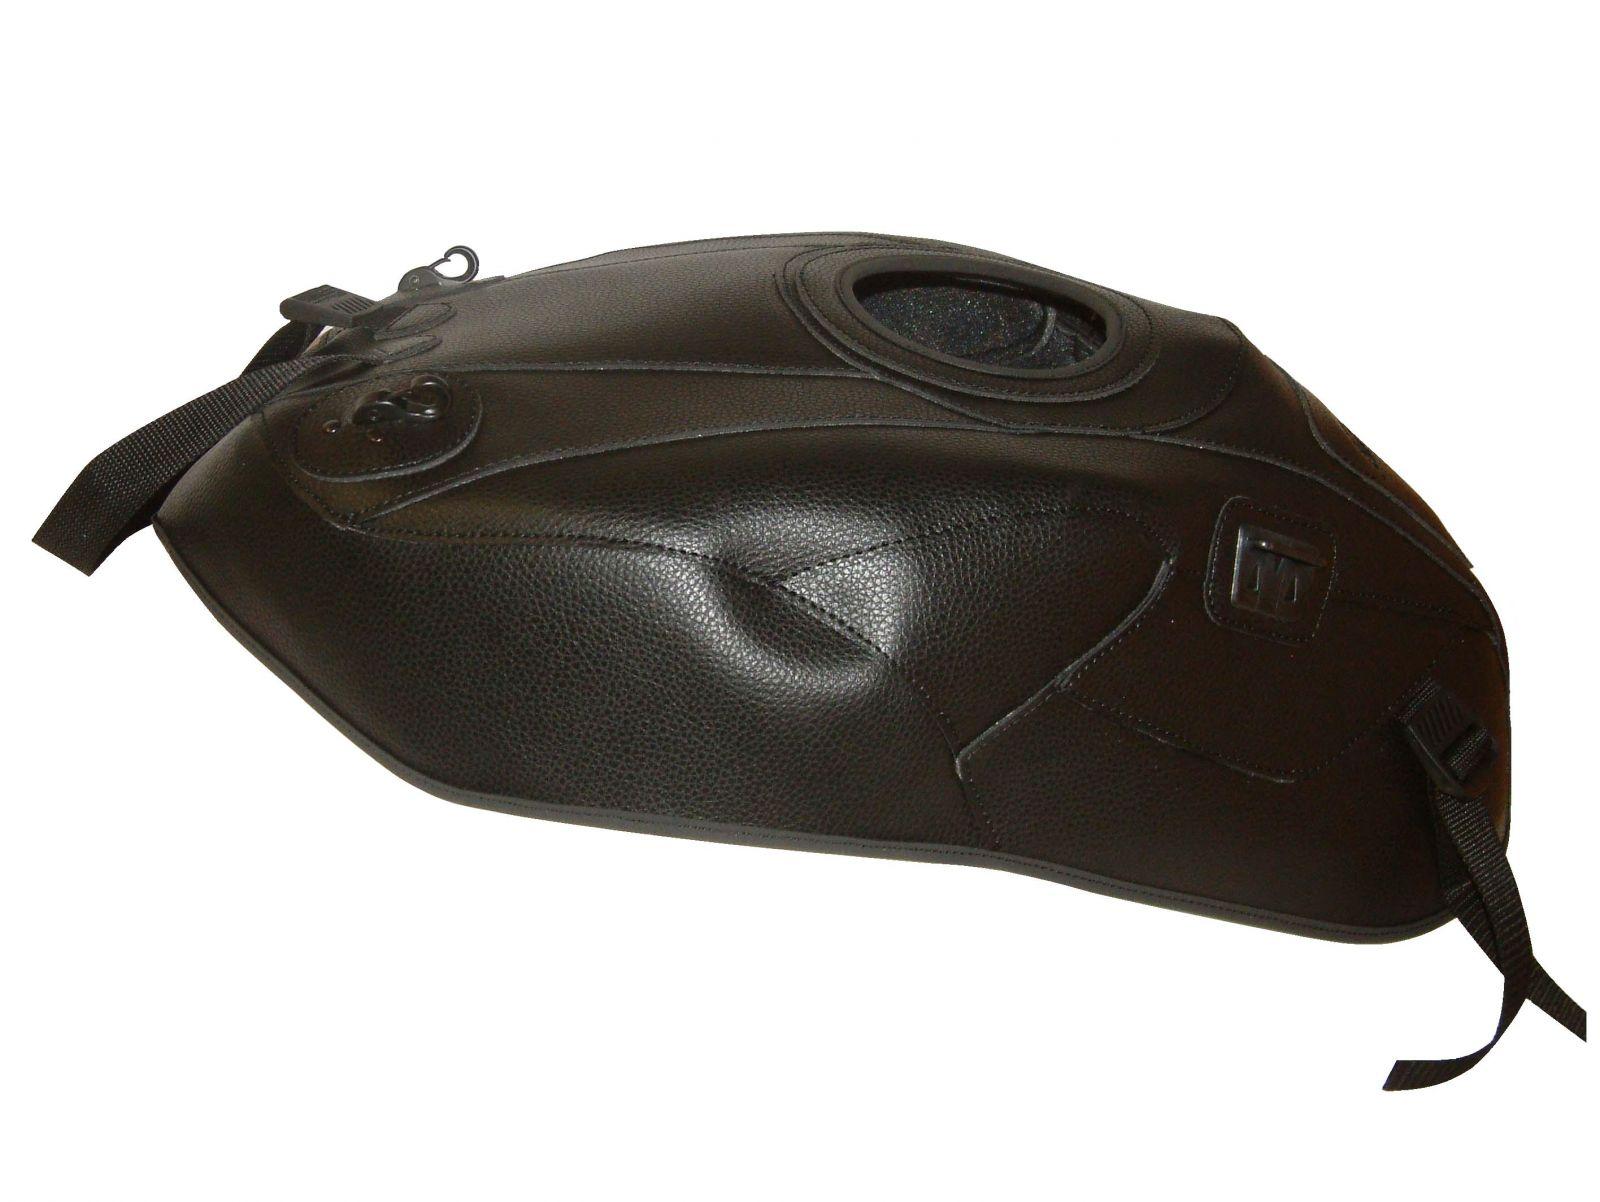 Capa de depósito TPR5993 - YAMAHA YZF R1 [≥ 2009]